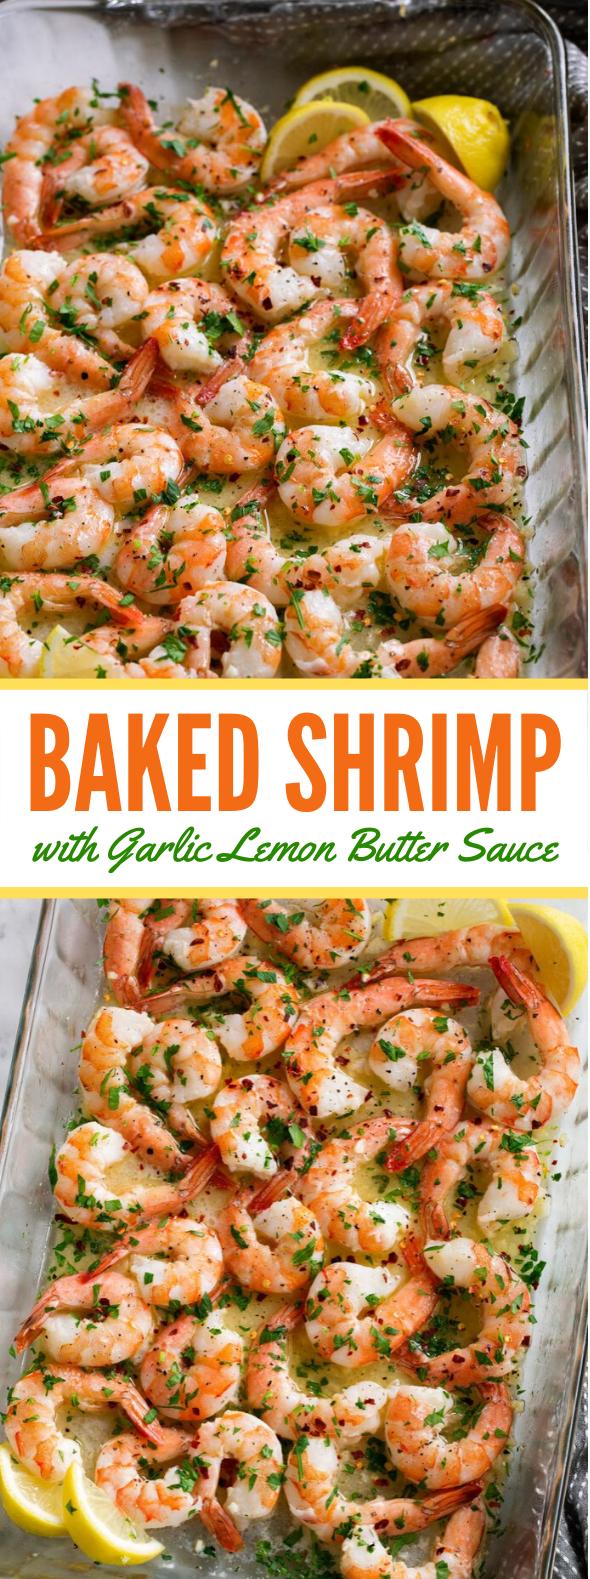 Baked Shrimp (with Garlic Lemon Butter Sauce) #dinner #lunch #sauce #meals #foodrecipe